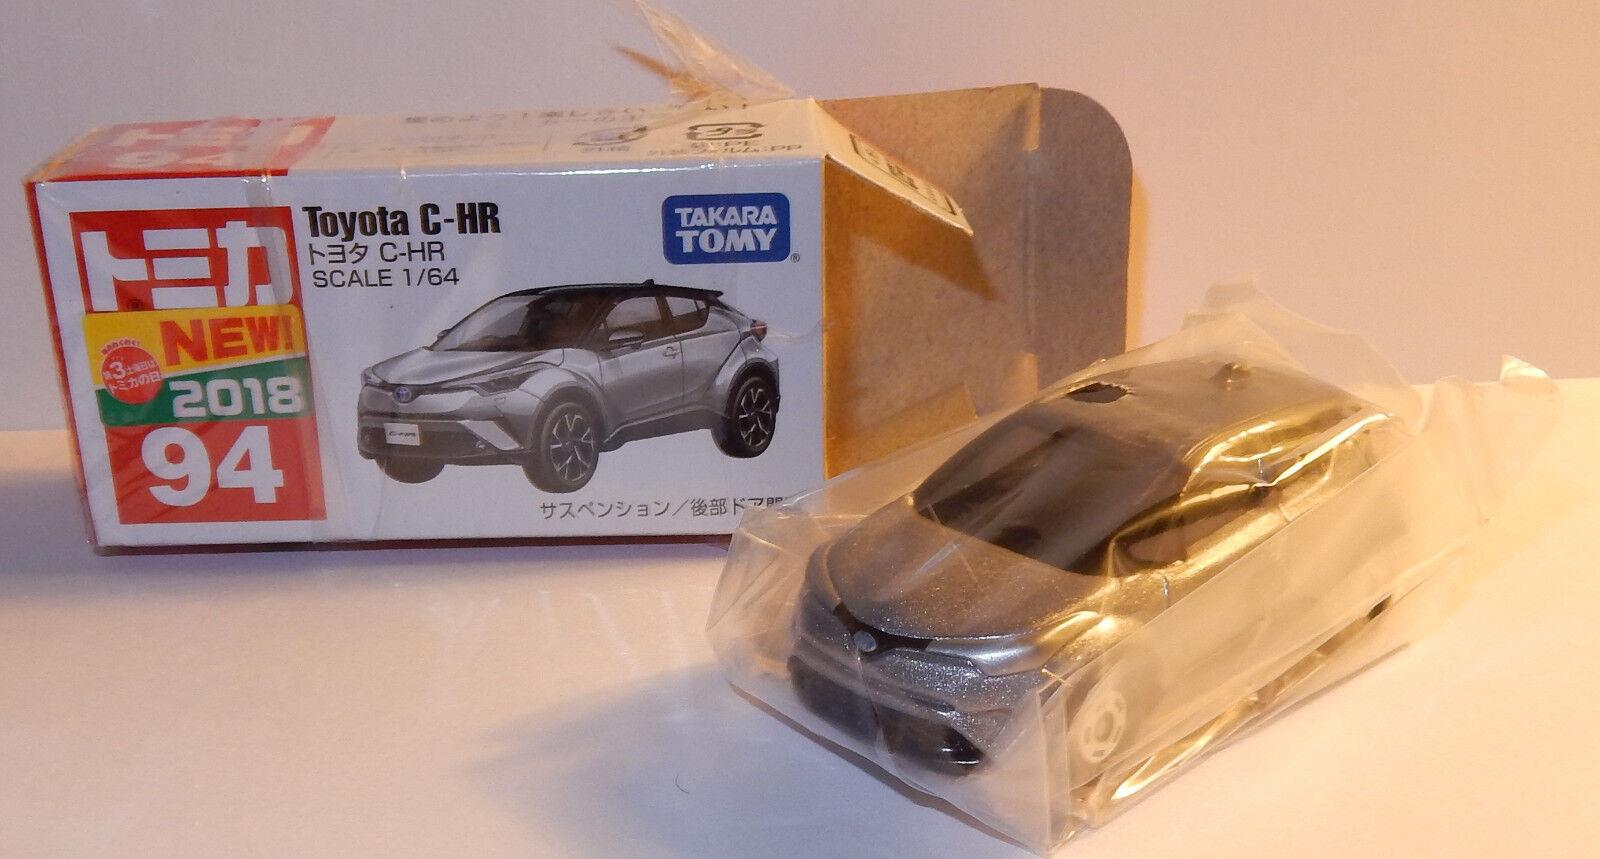 Toy Car Takara Tomy Tomica 94 Toyota C Hr Display Mini Car 3 Inches 1 64 in Box